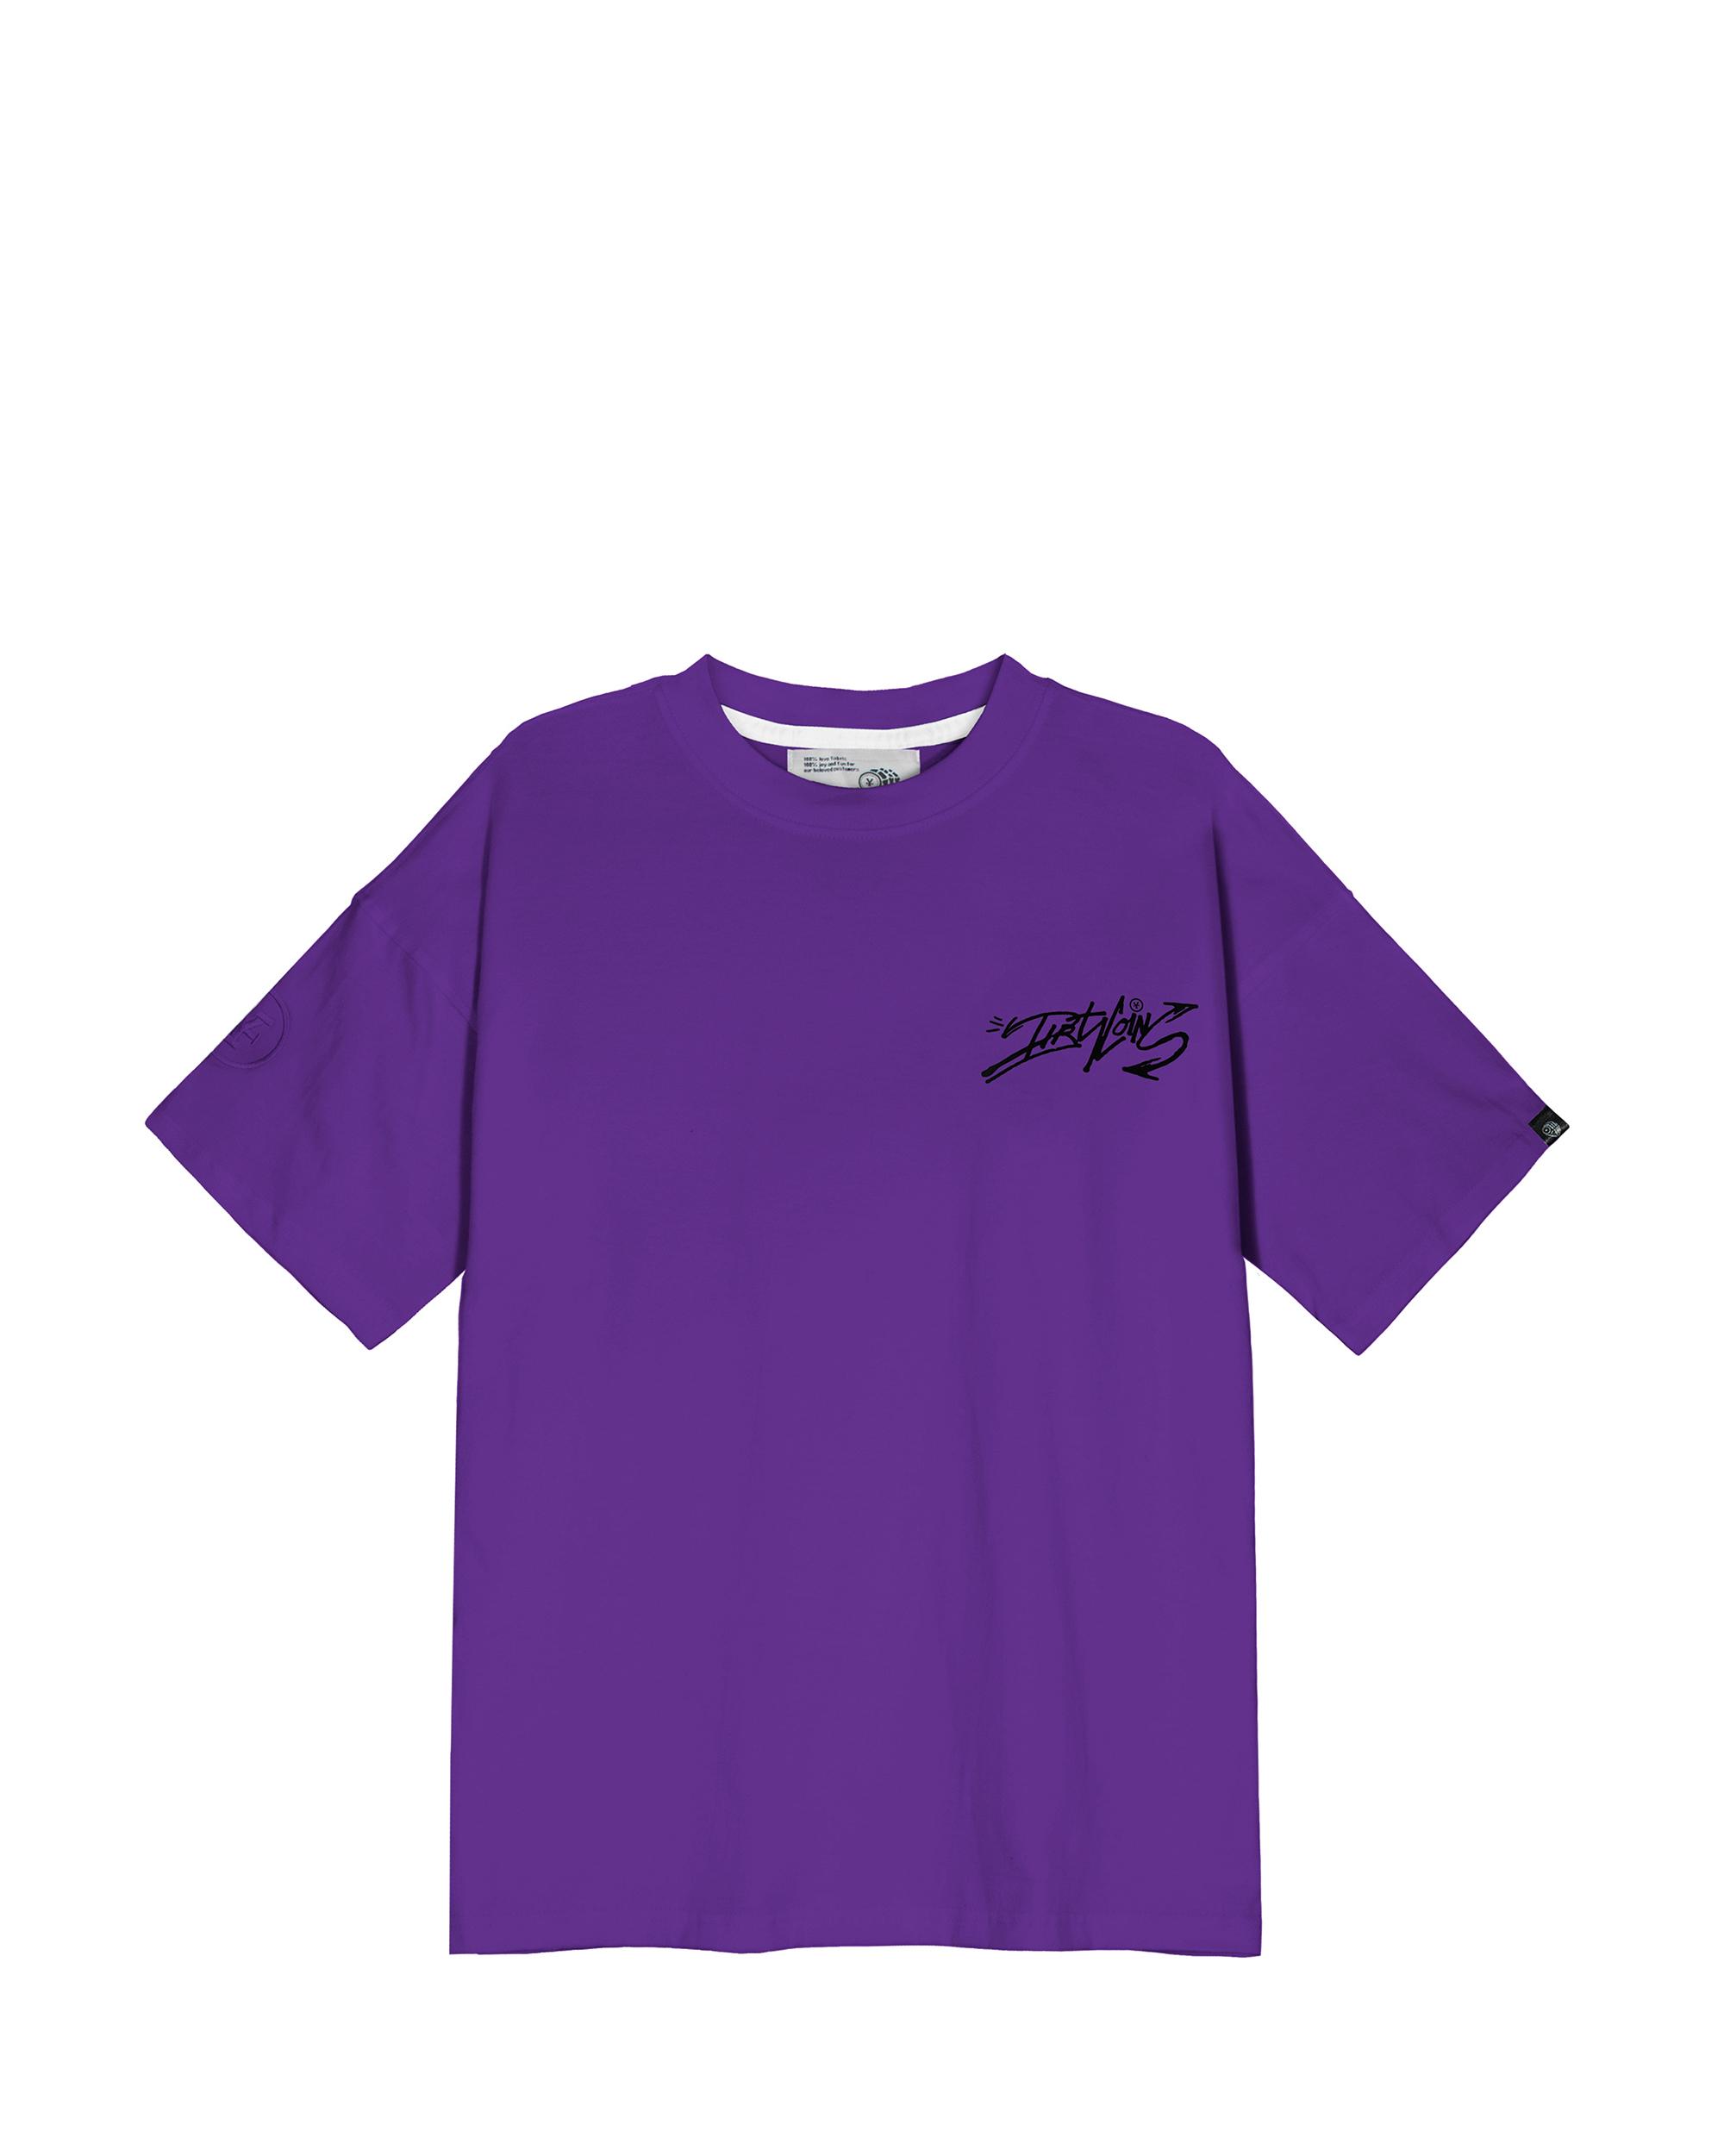 DirtyCoins Graffitee - Purple